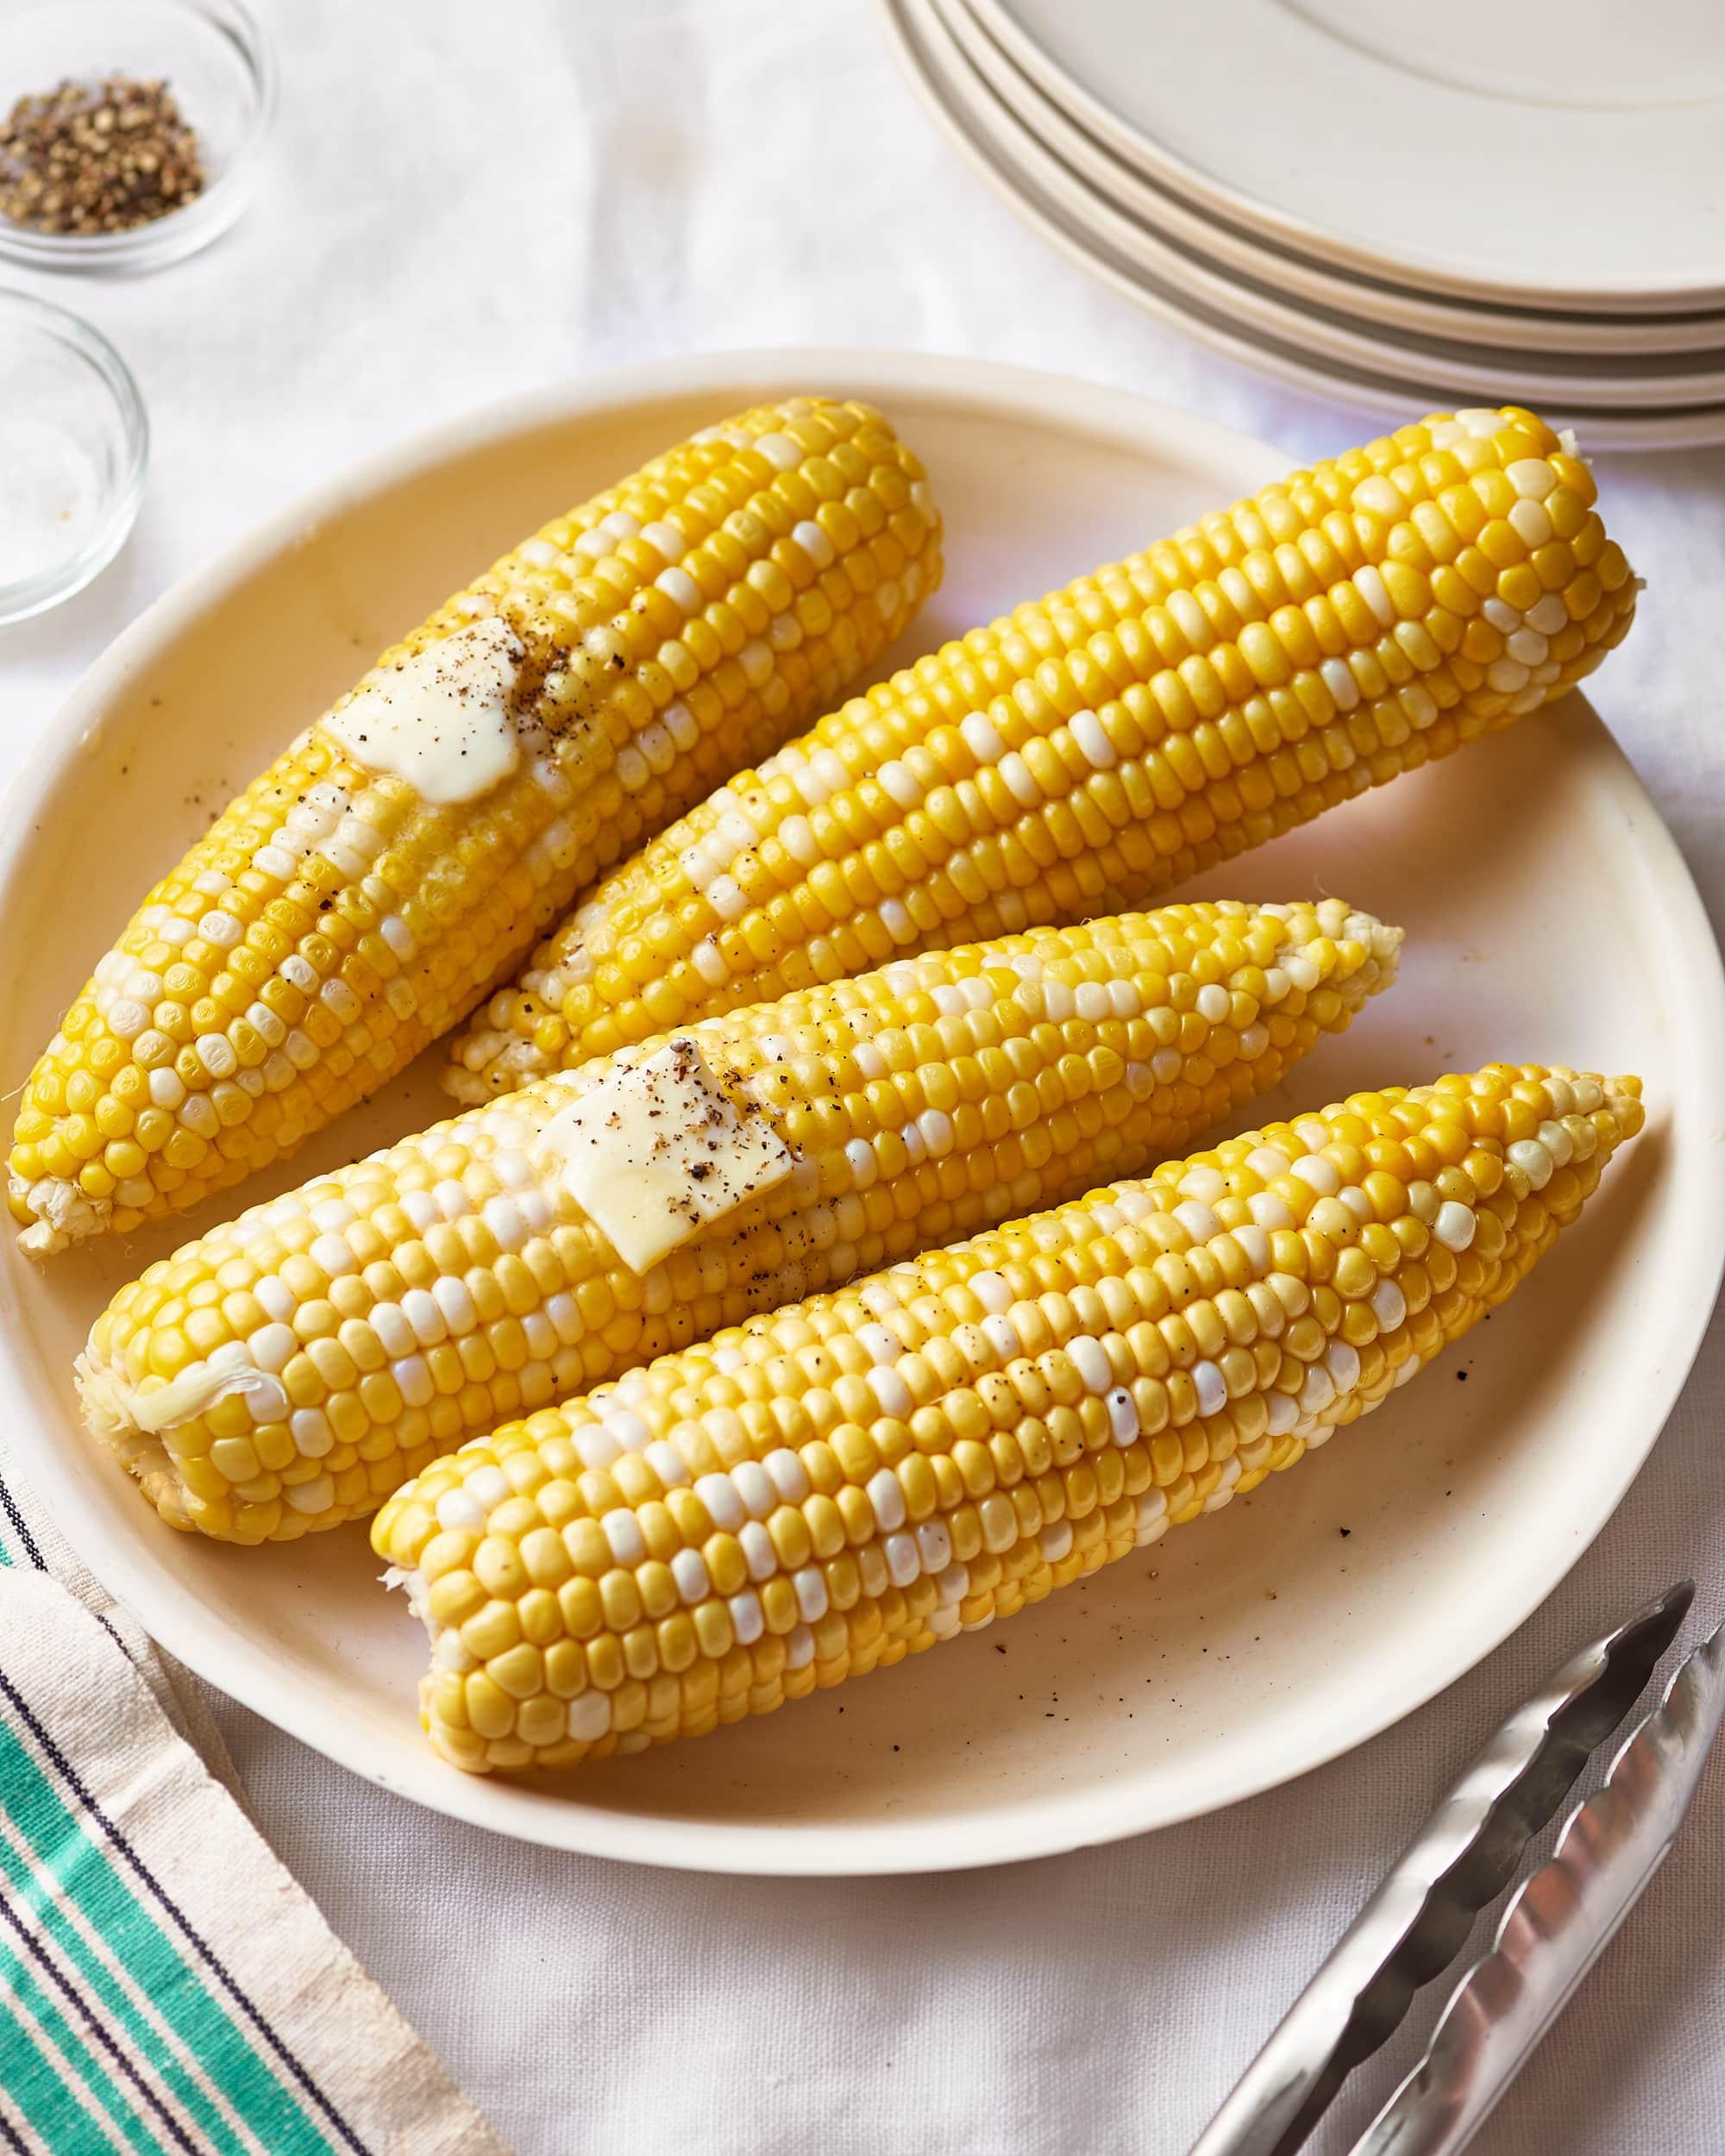 how long do i boil corn on the cob for